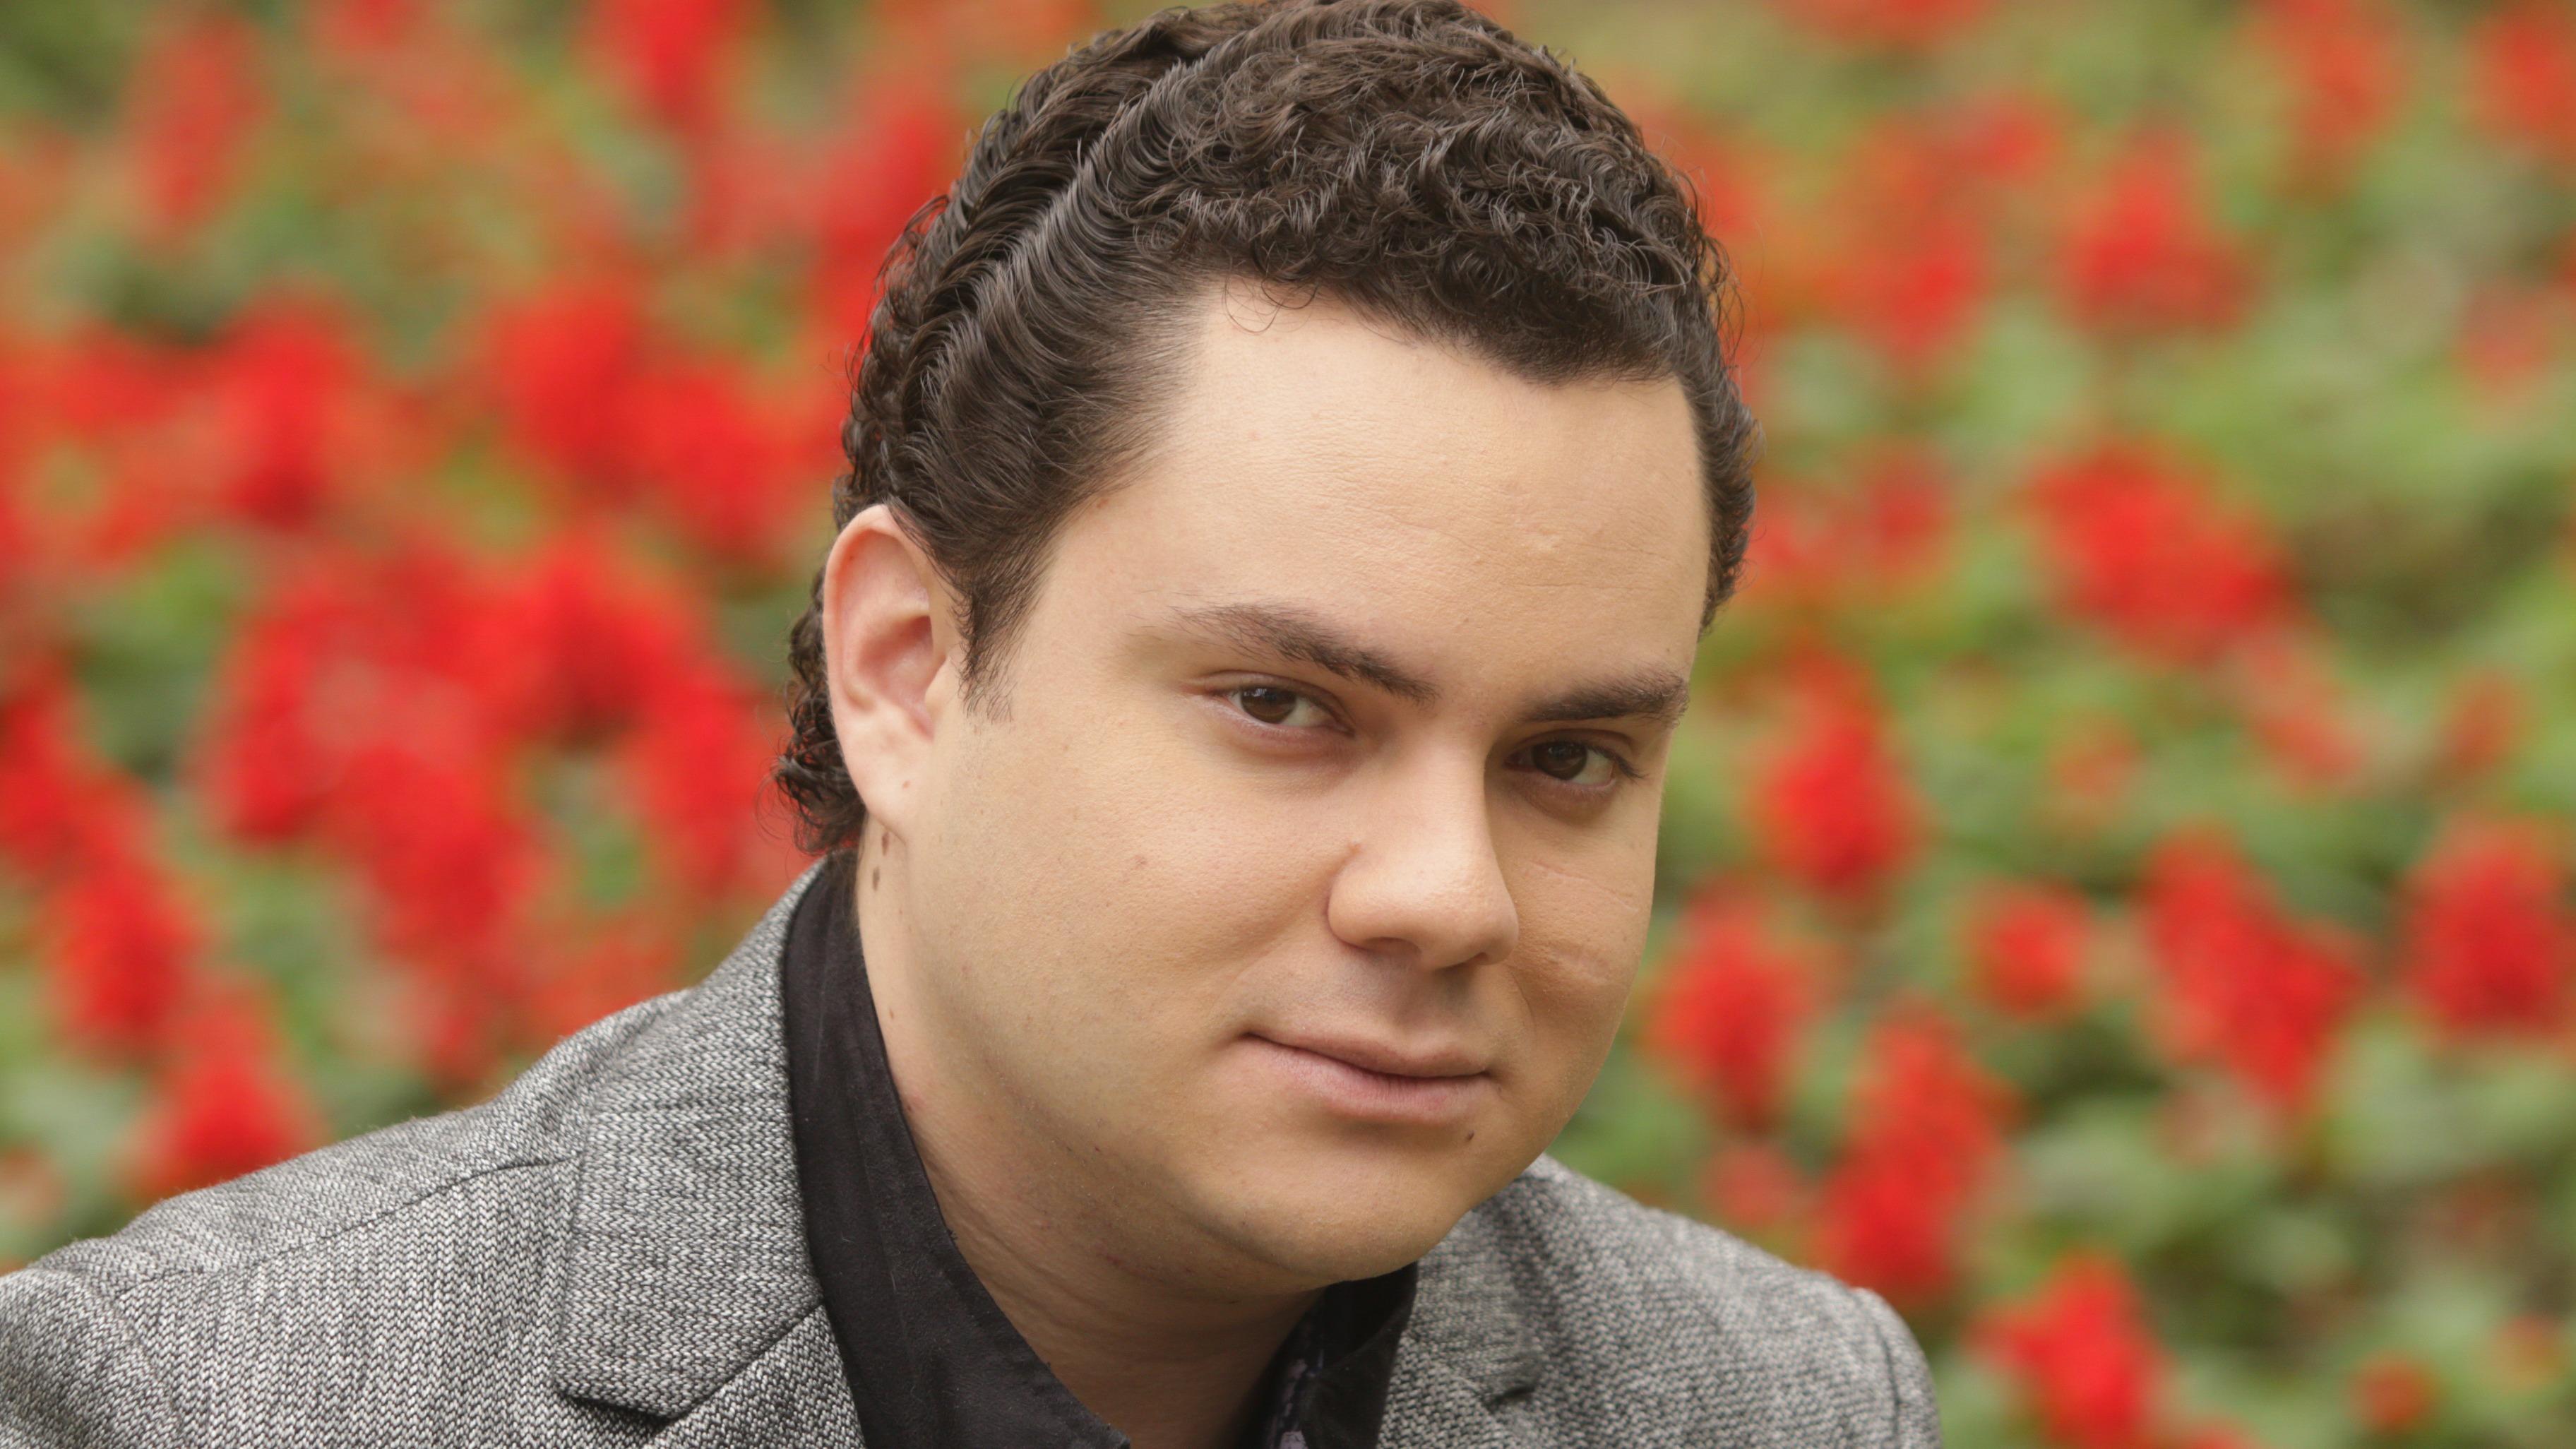 Manuel José interpreta